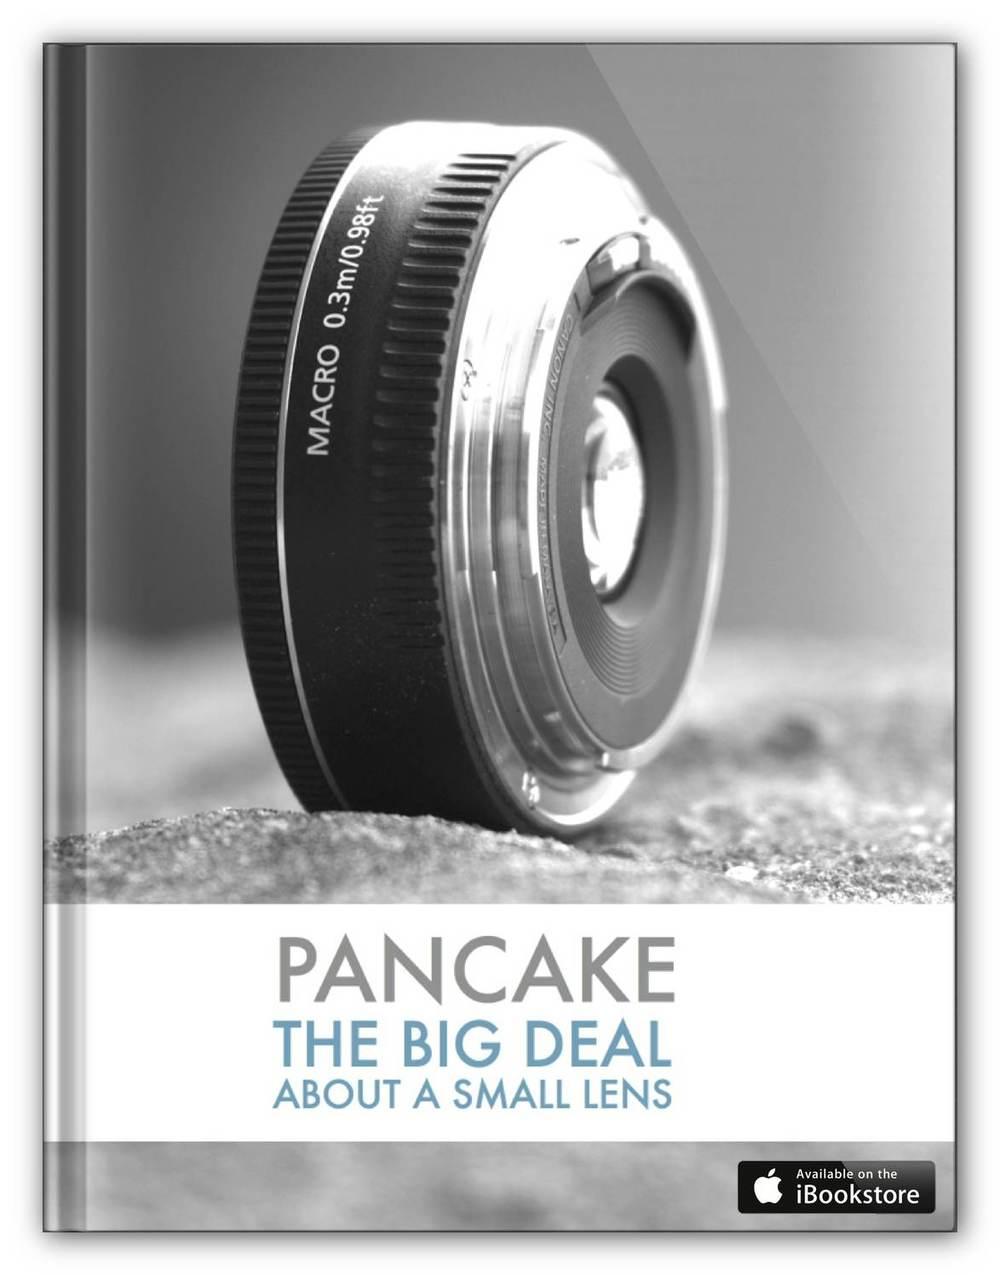 Pancake Book Cover